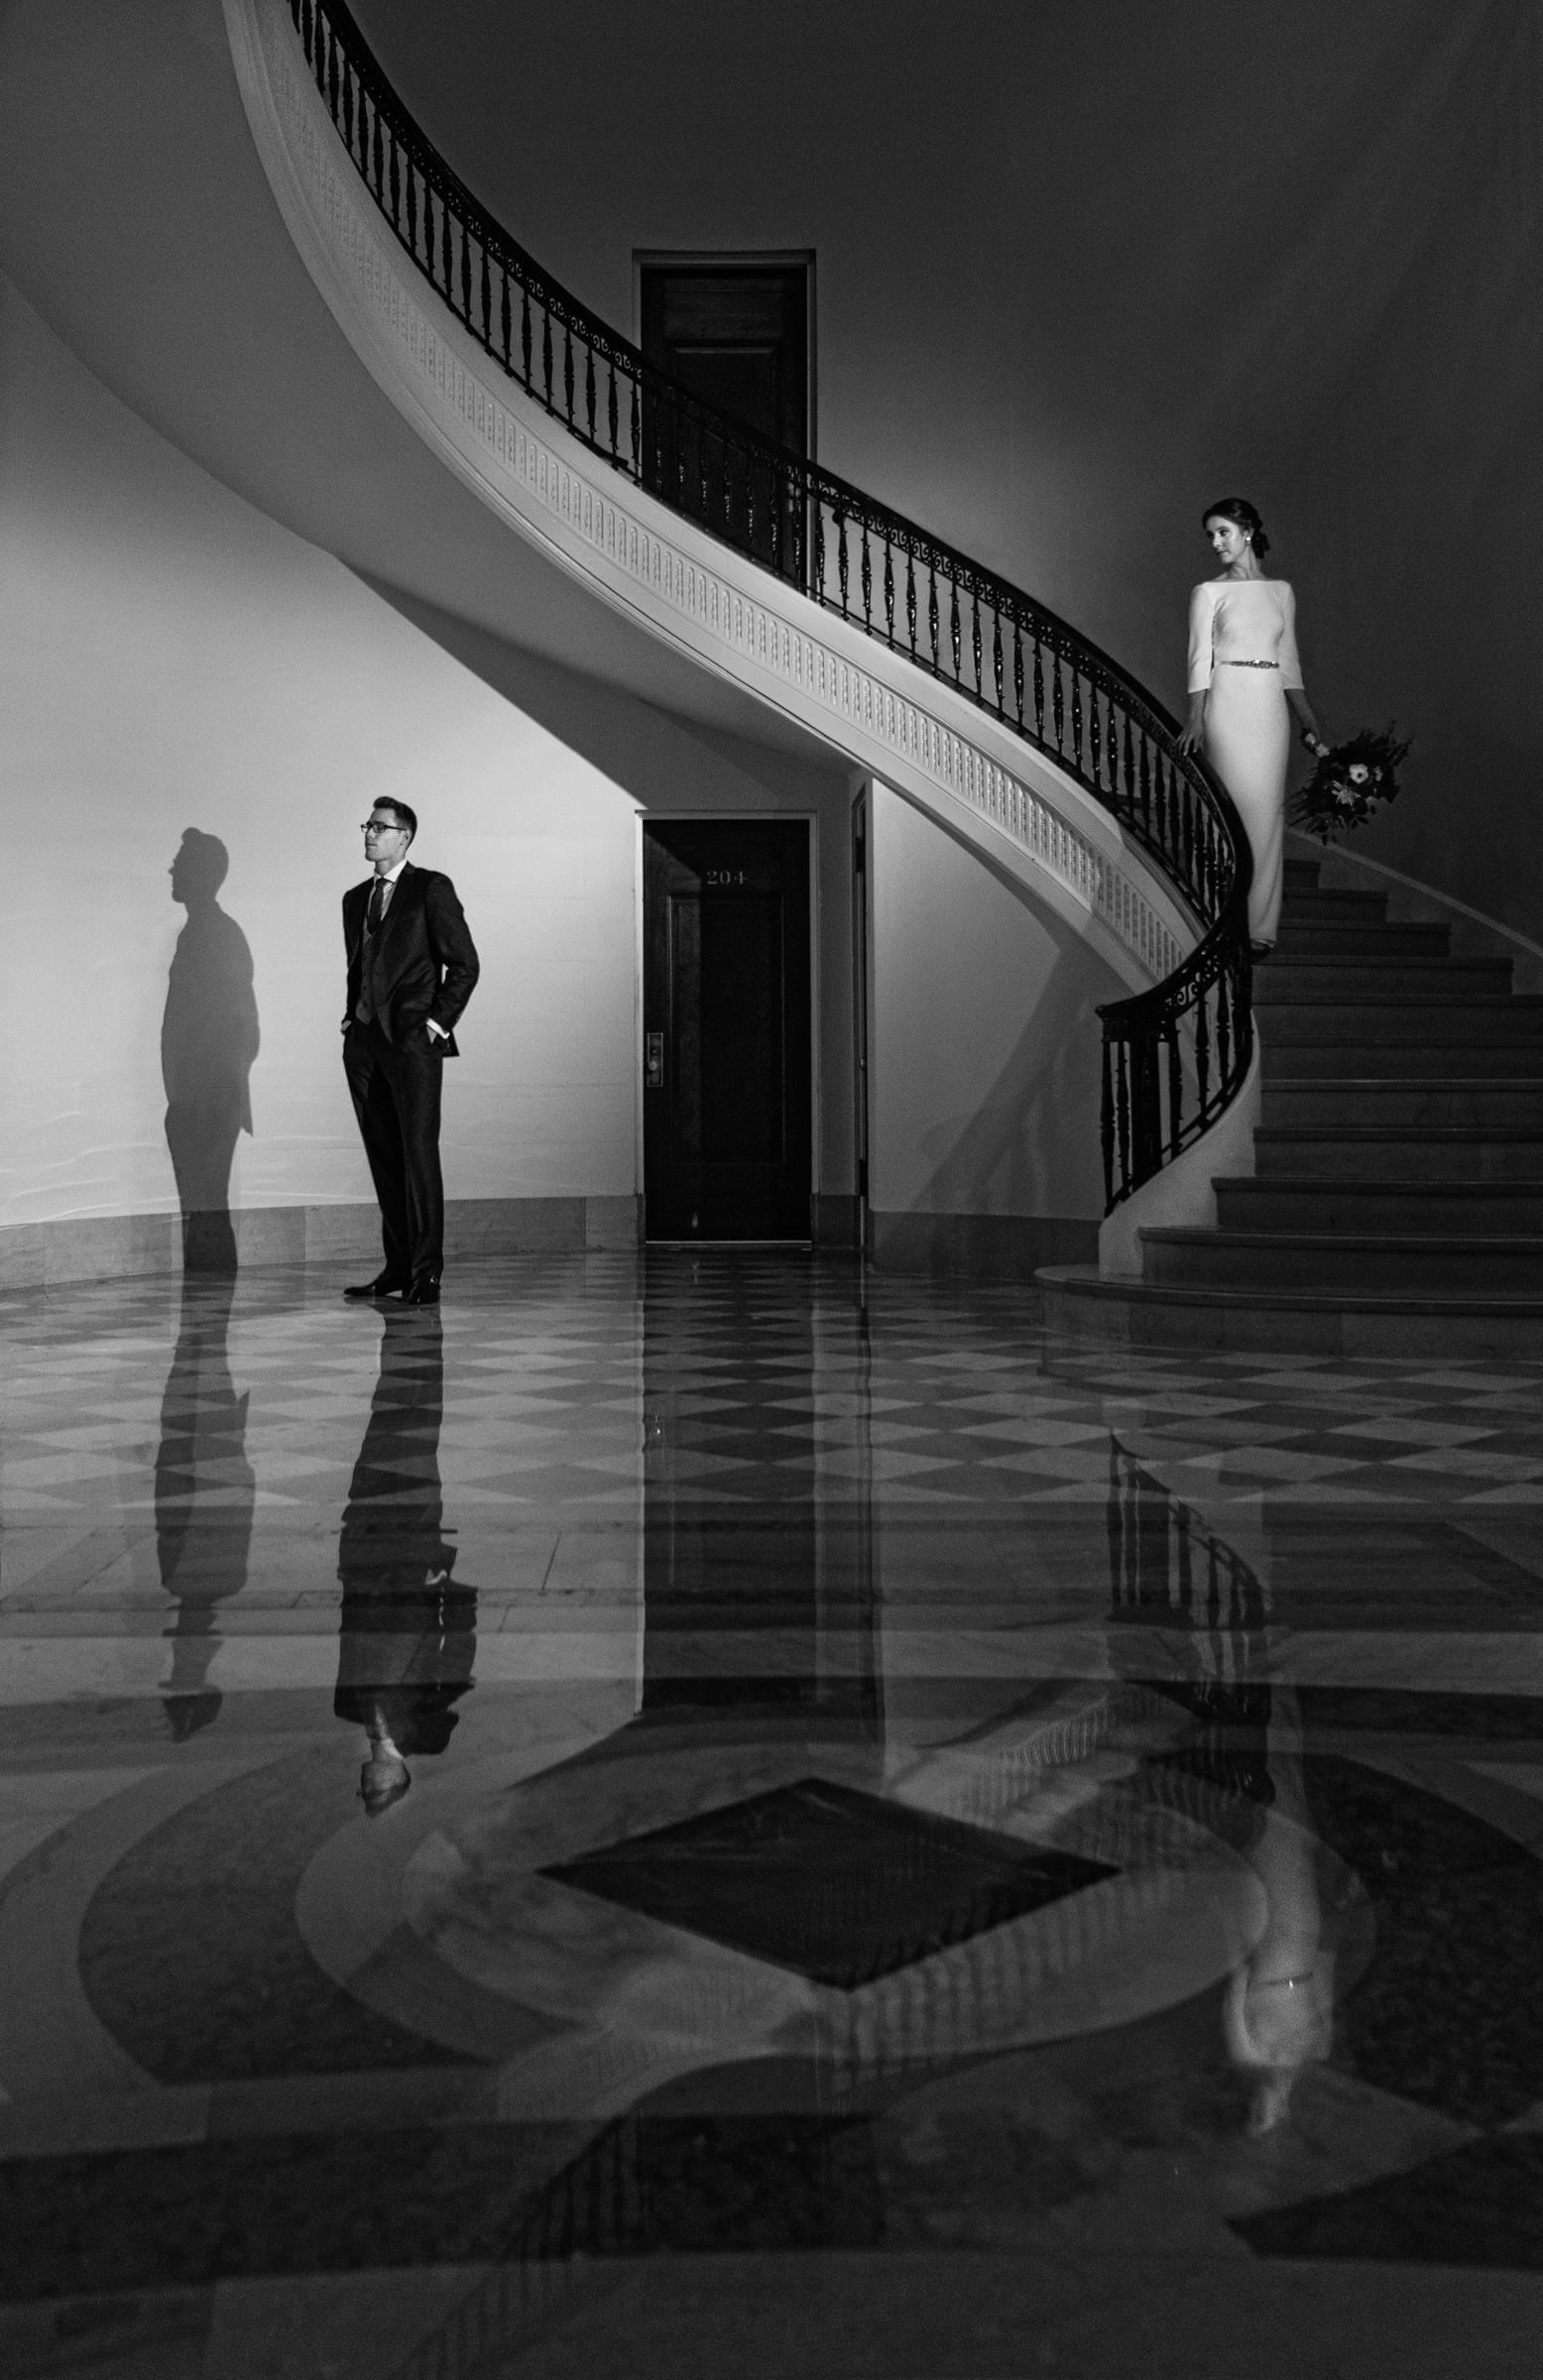 elegant-bride-descending-staircase-photography-by-steve-jane